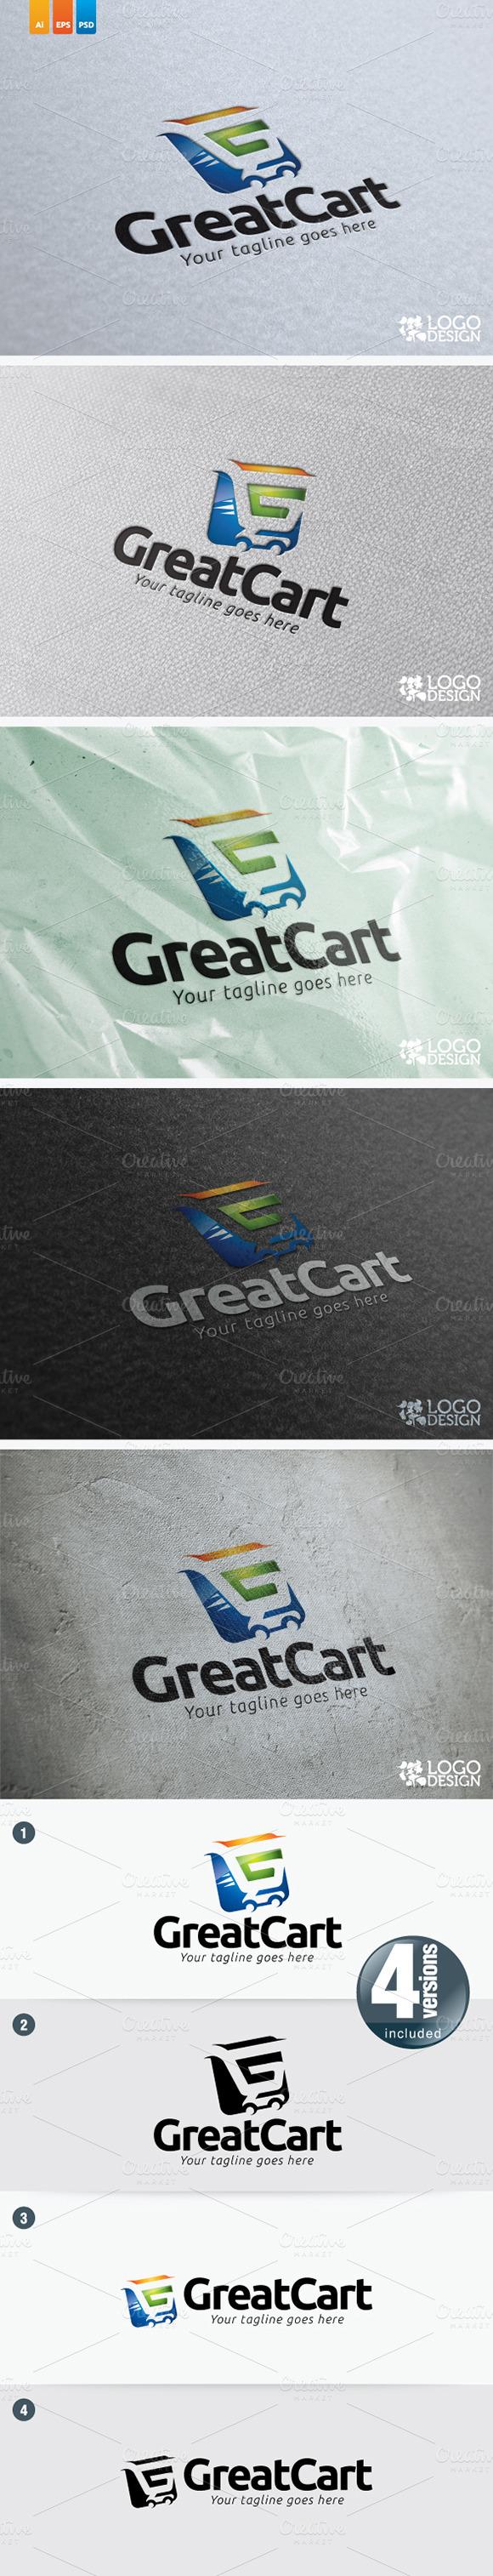 Great Cart